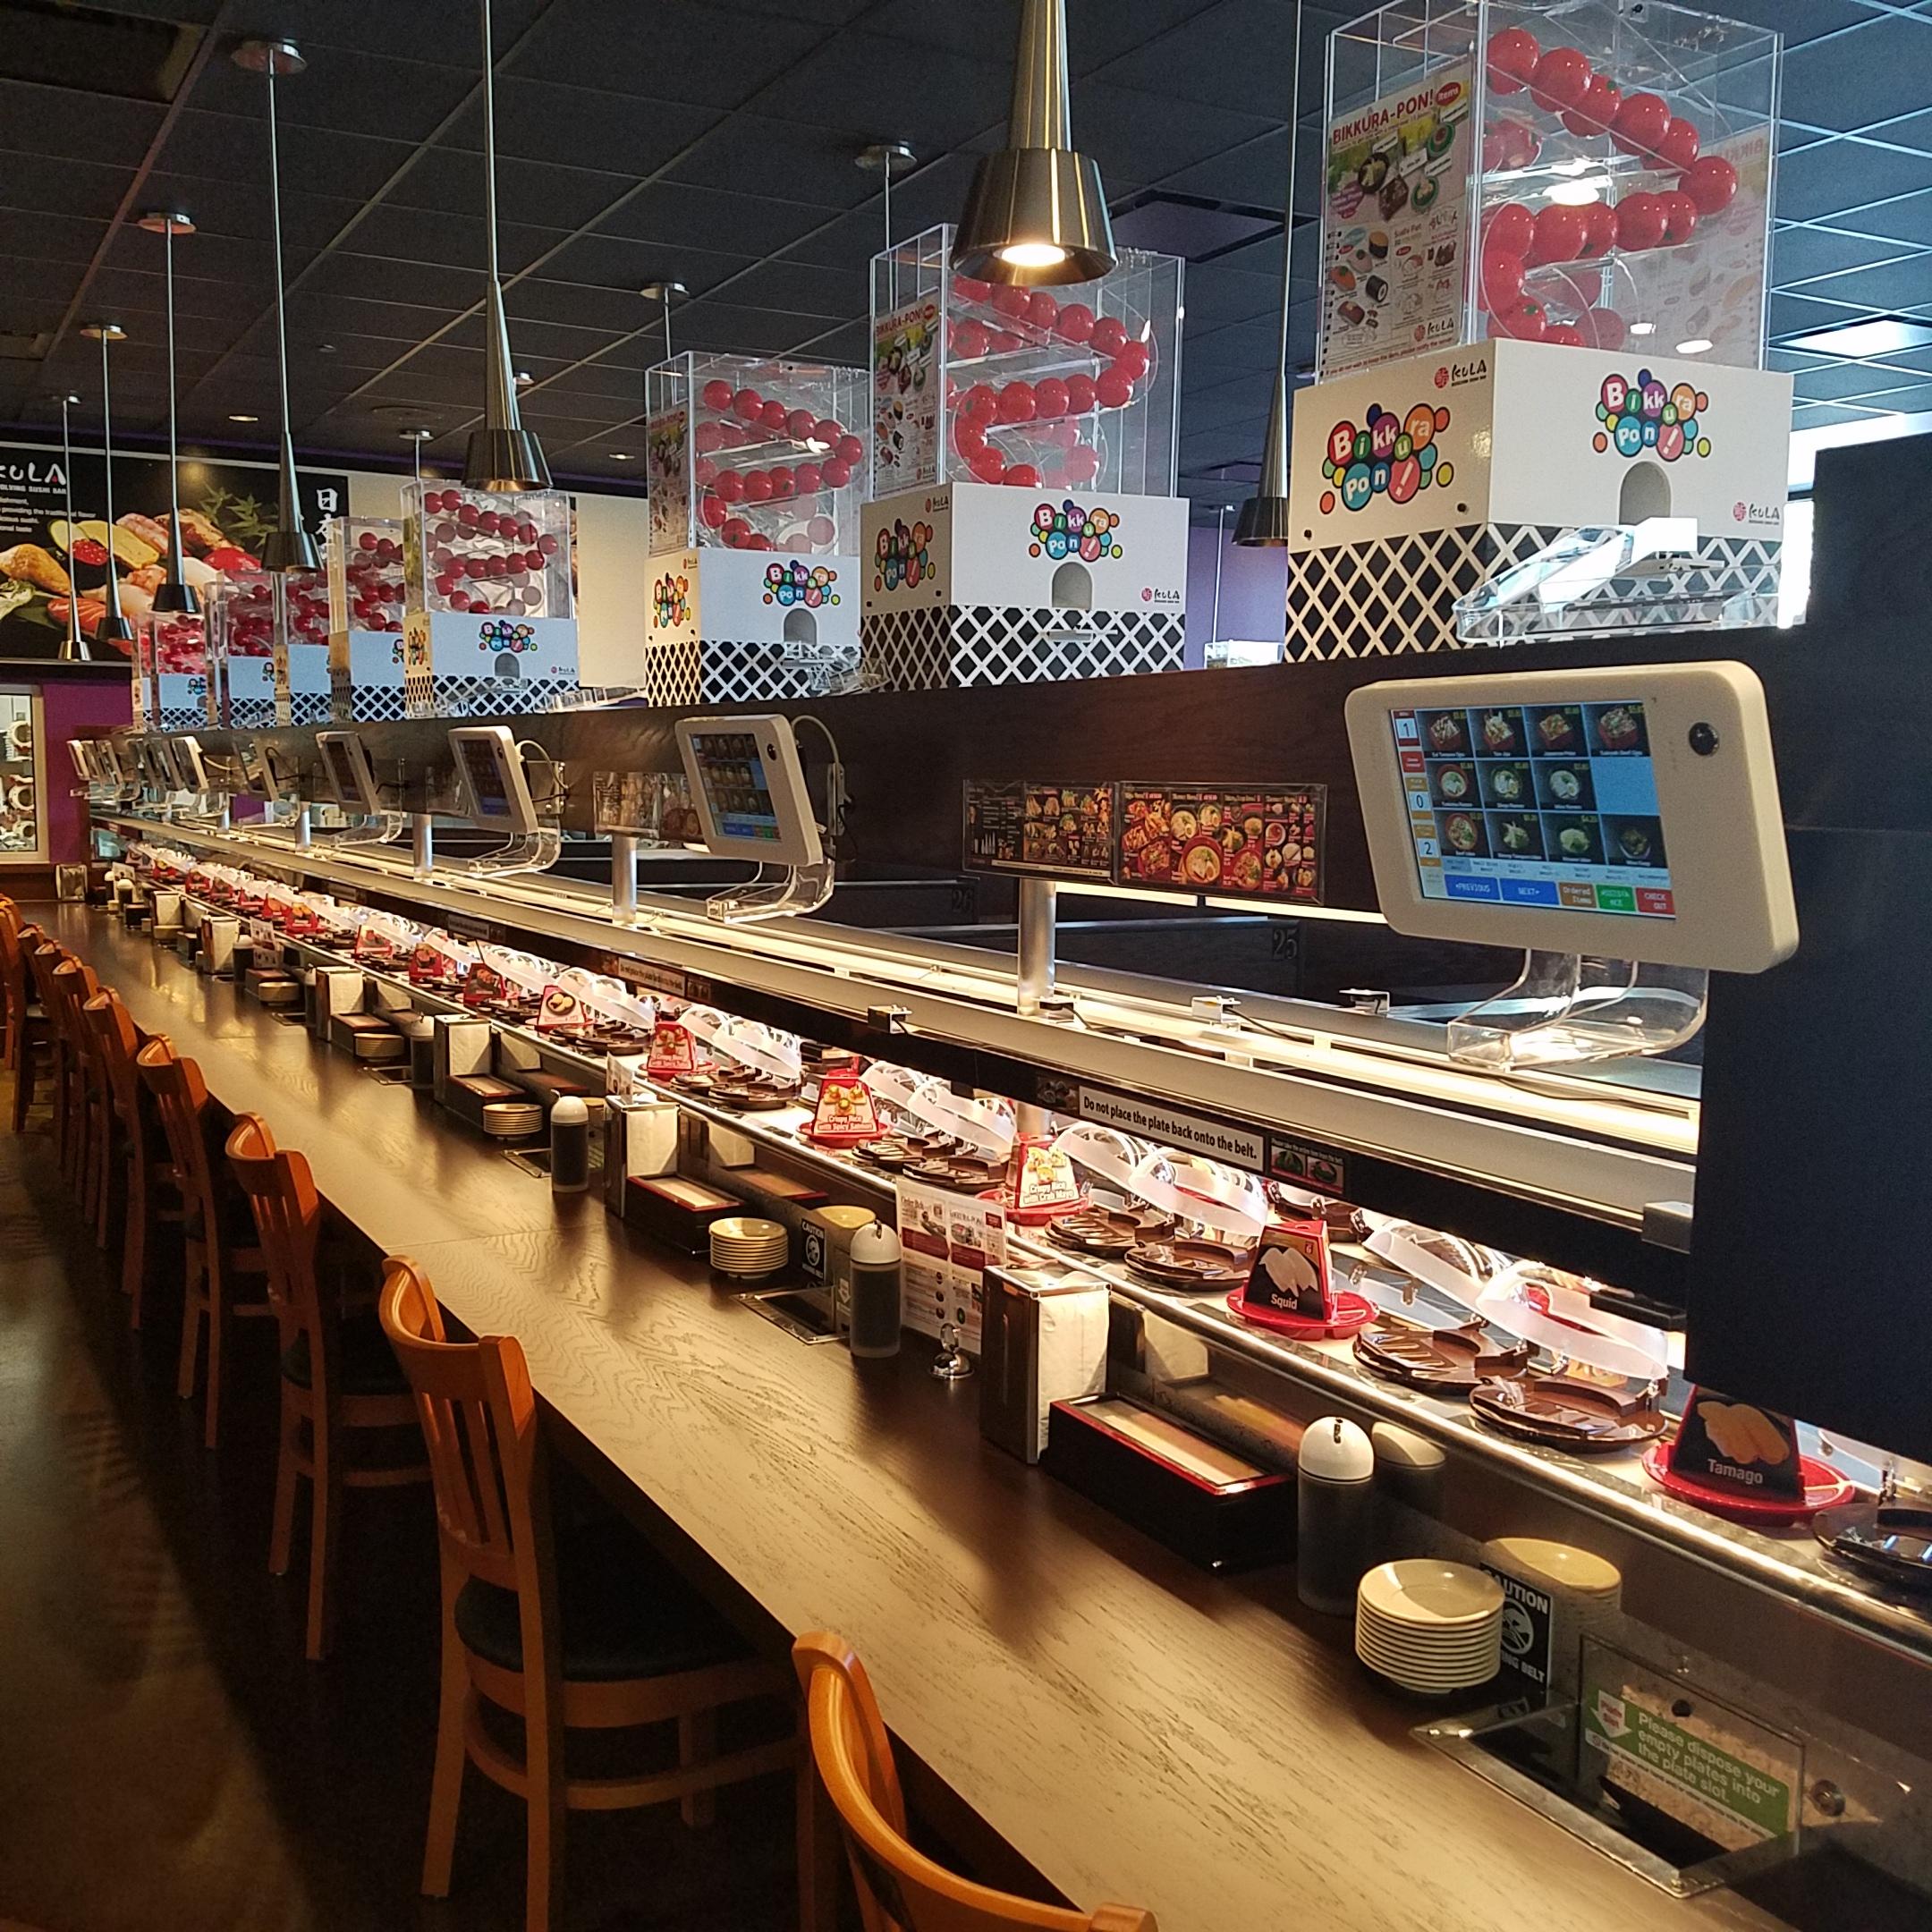 Kula, a new conveyor belt sushi spot, just opened in Doraville